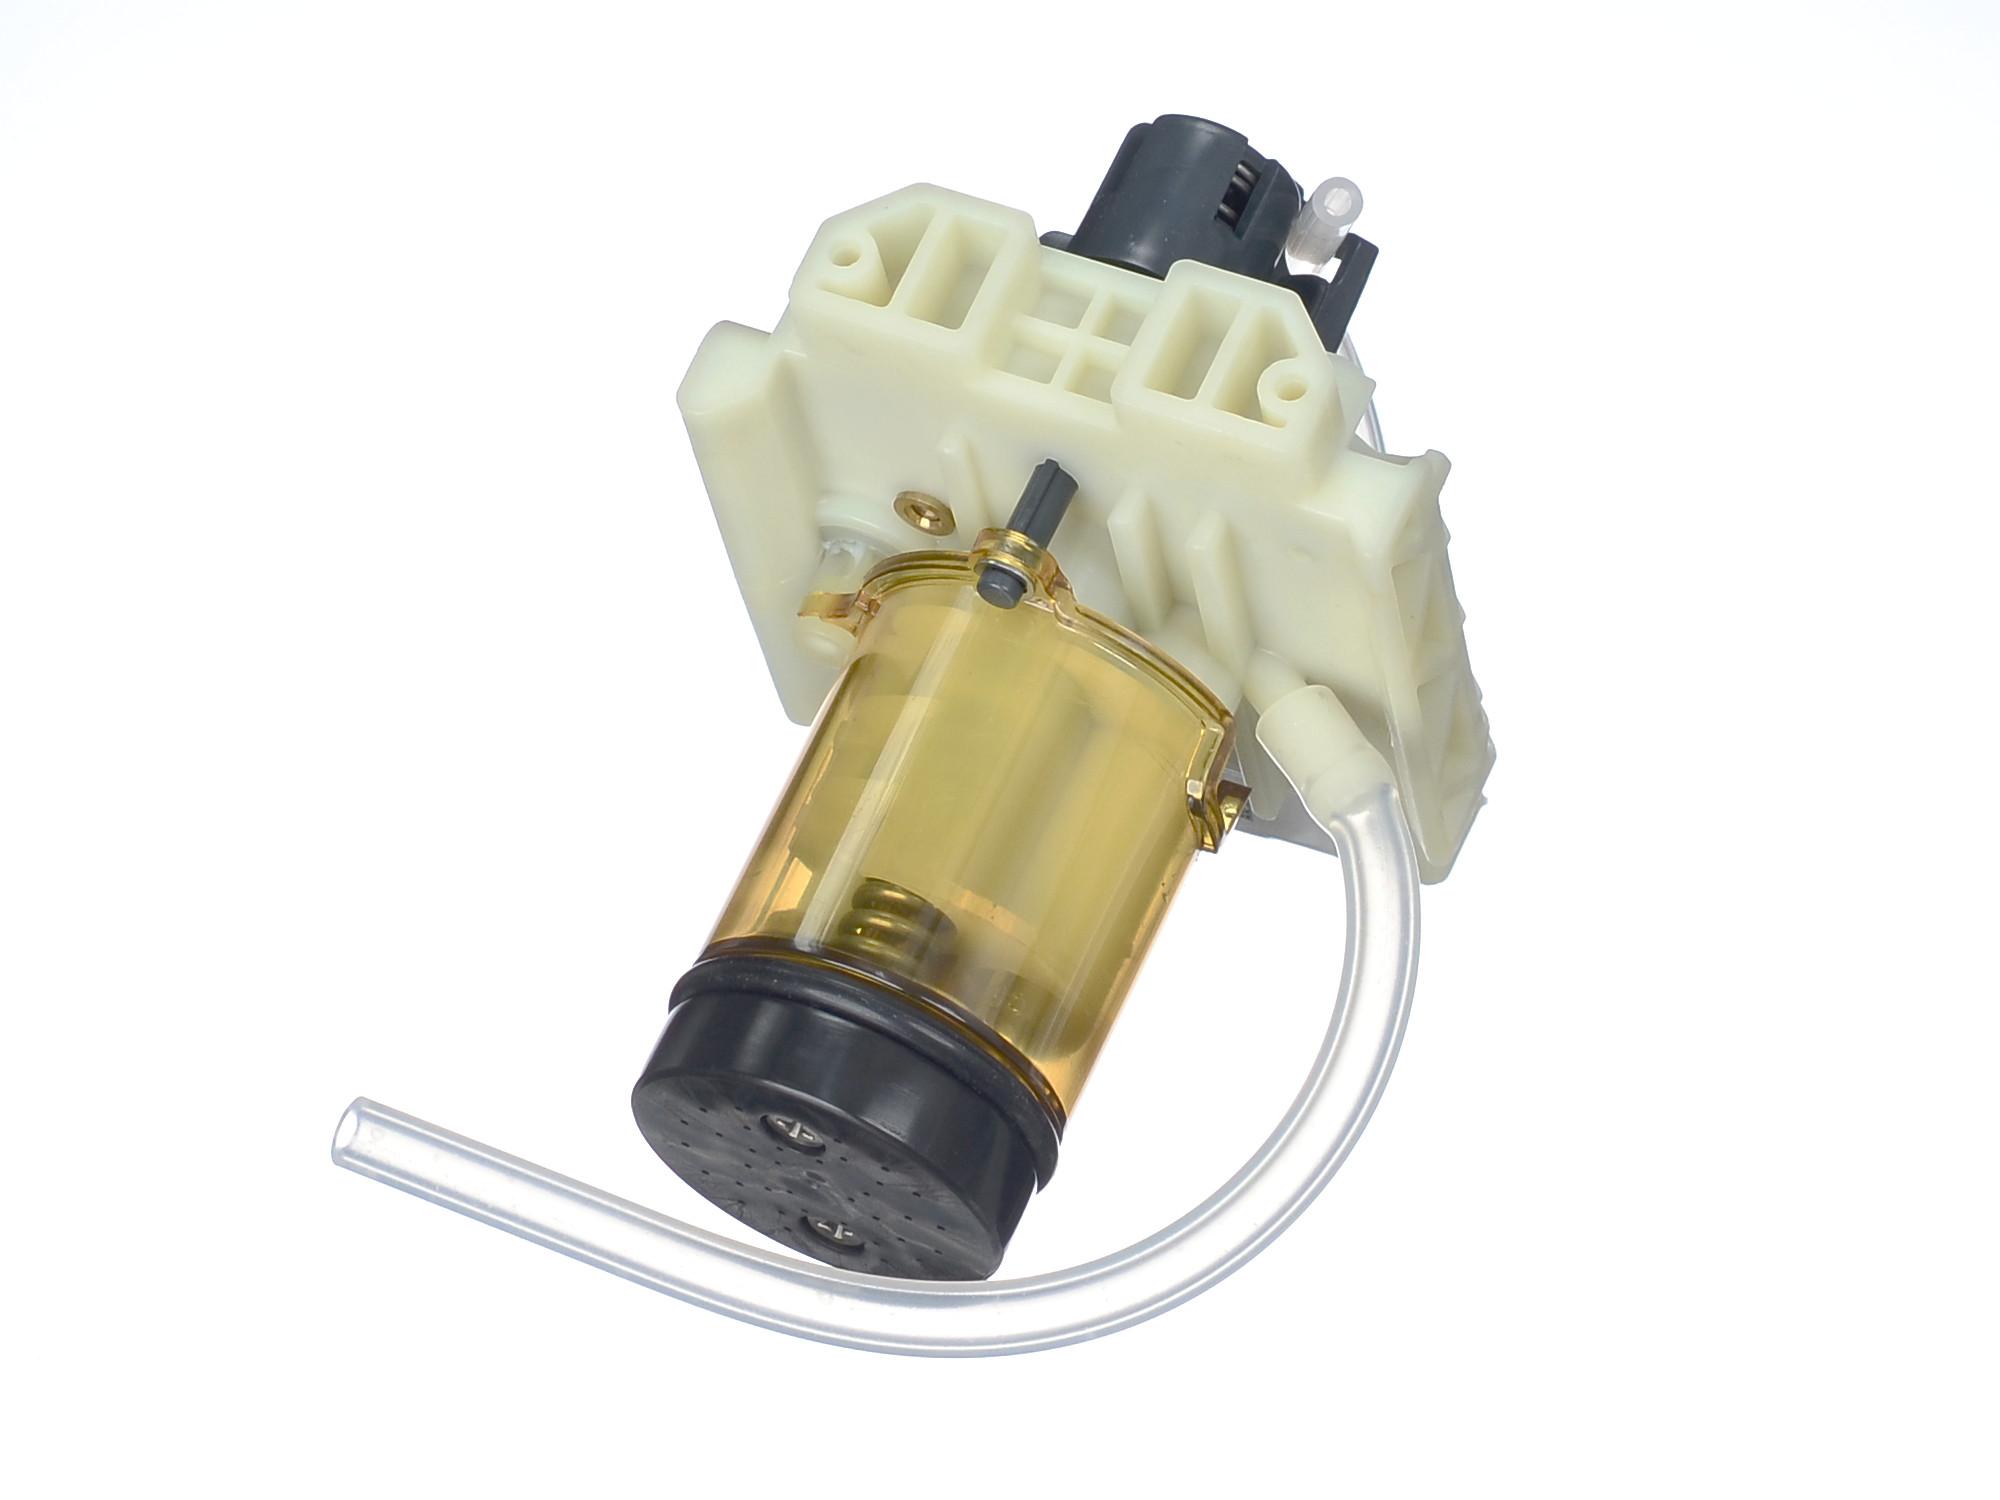 DeLonghi Brühkolben Kolben ECAM ETAM zu Heizung Durchlauferhitzer Thermoblock